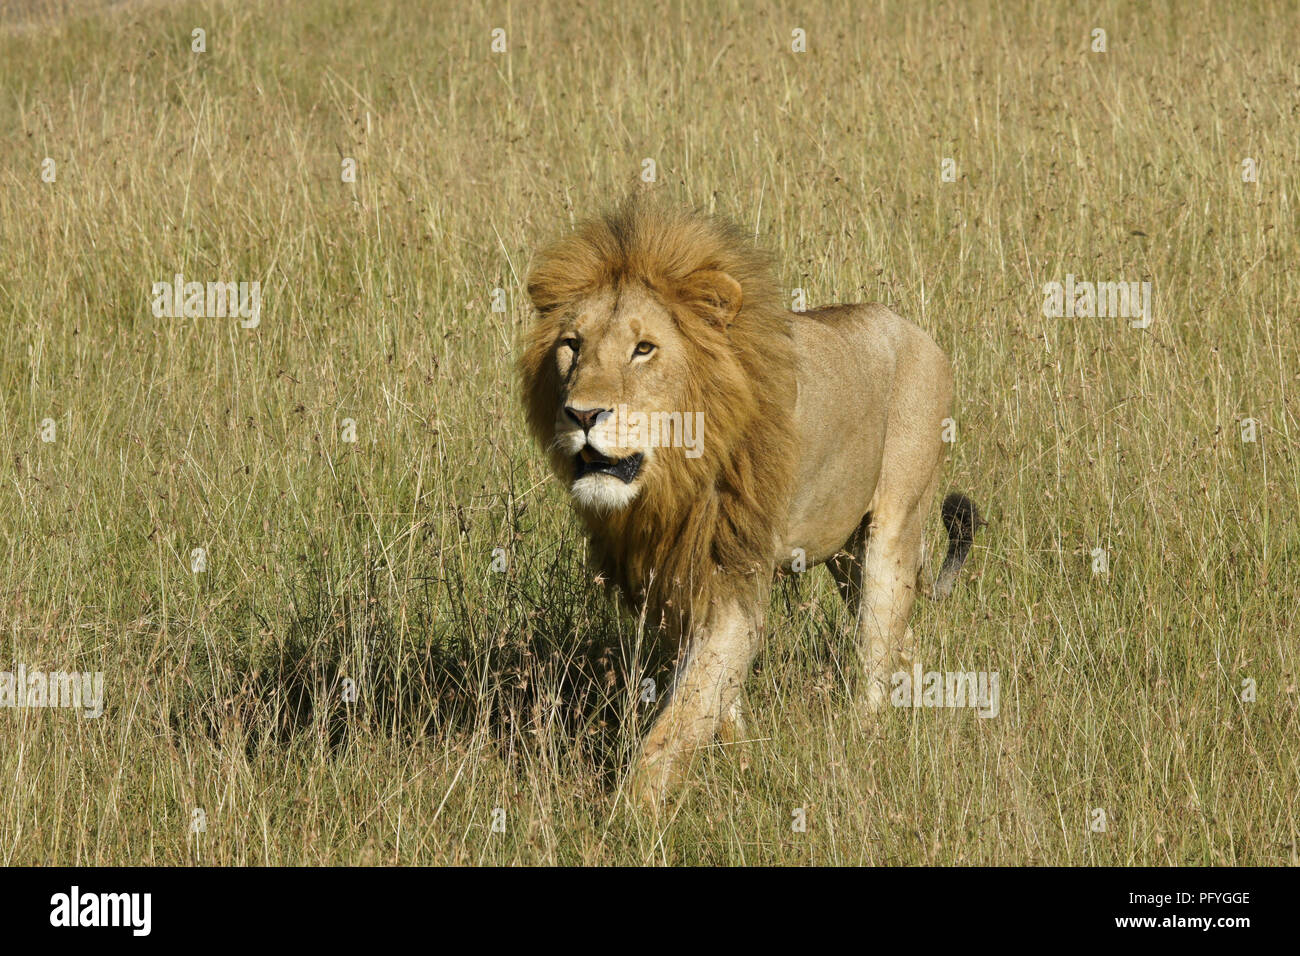 Male lion walking in long grass, Masai Mara Game Reserve, Kenya Stock Photo